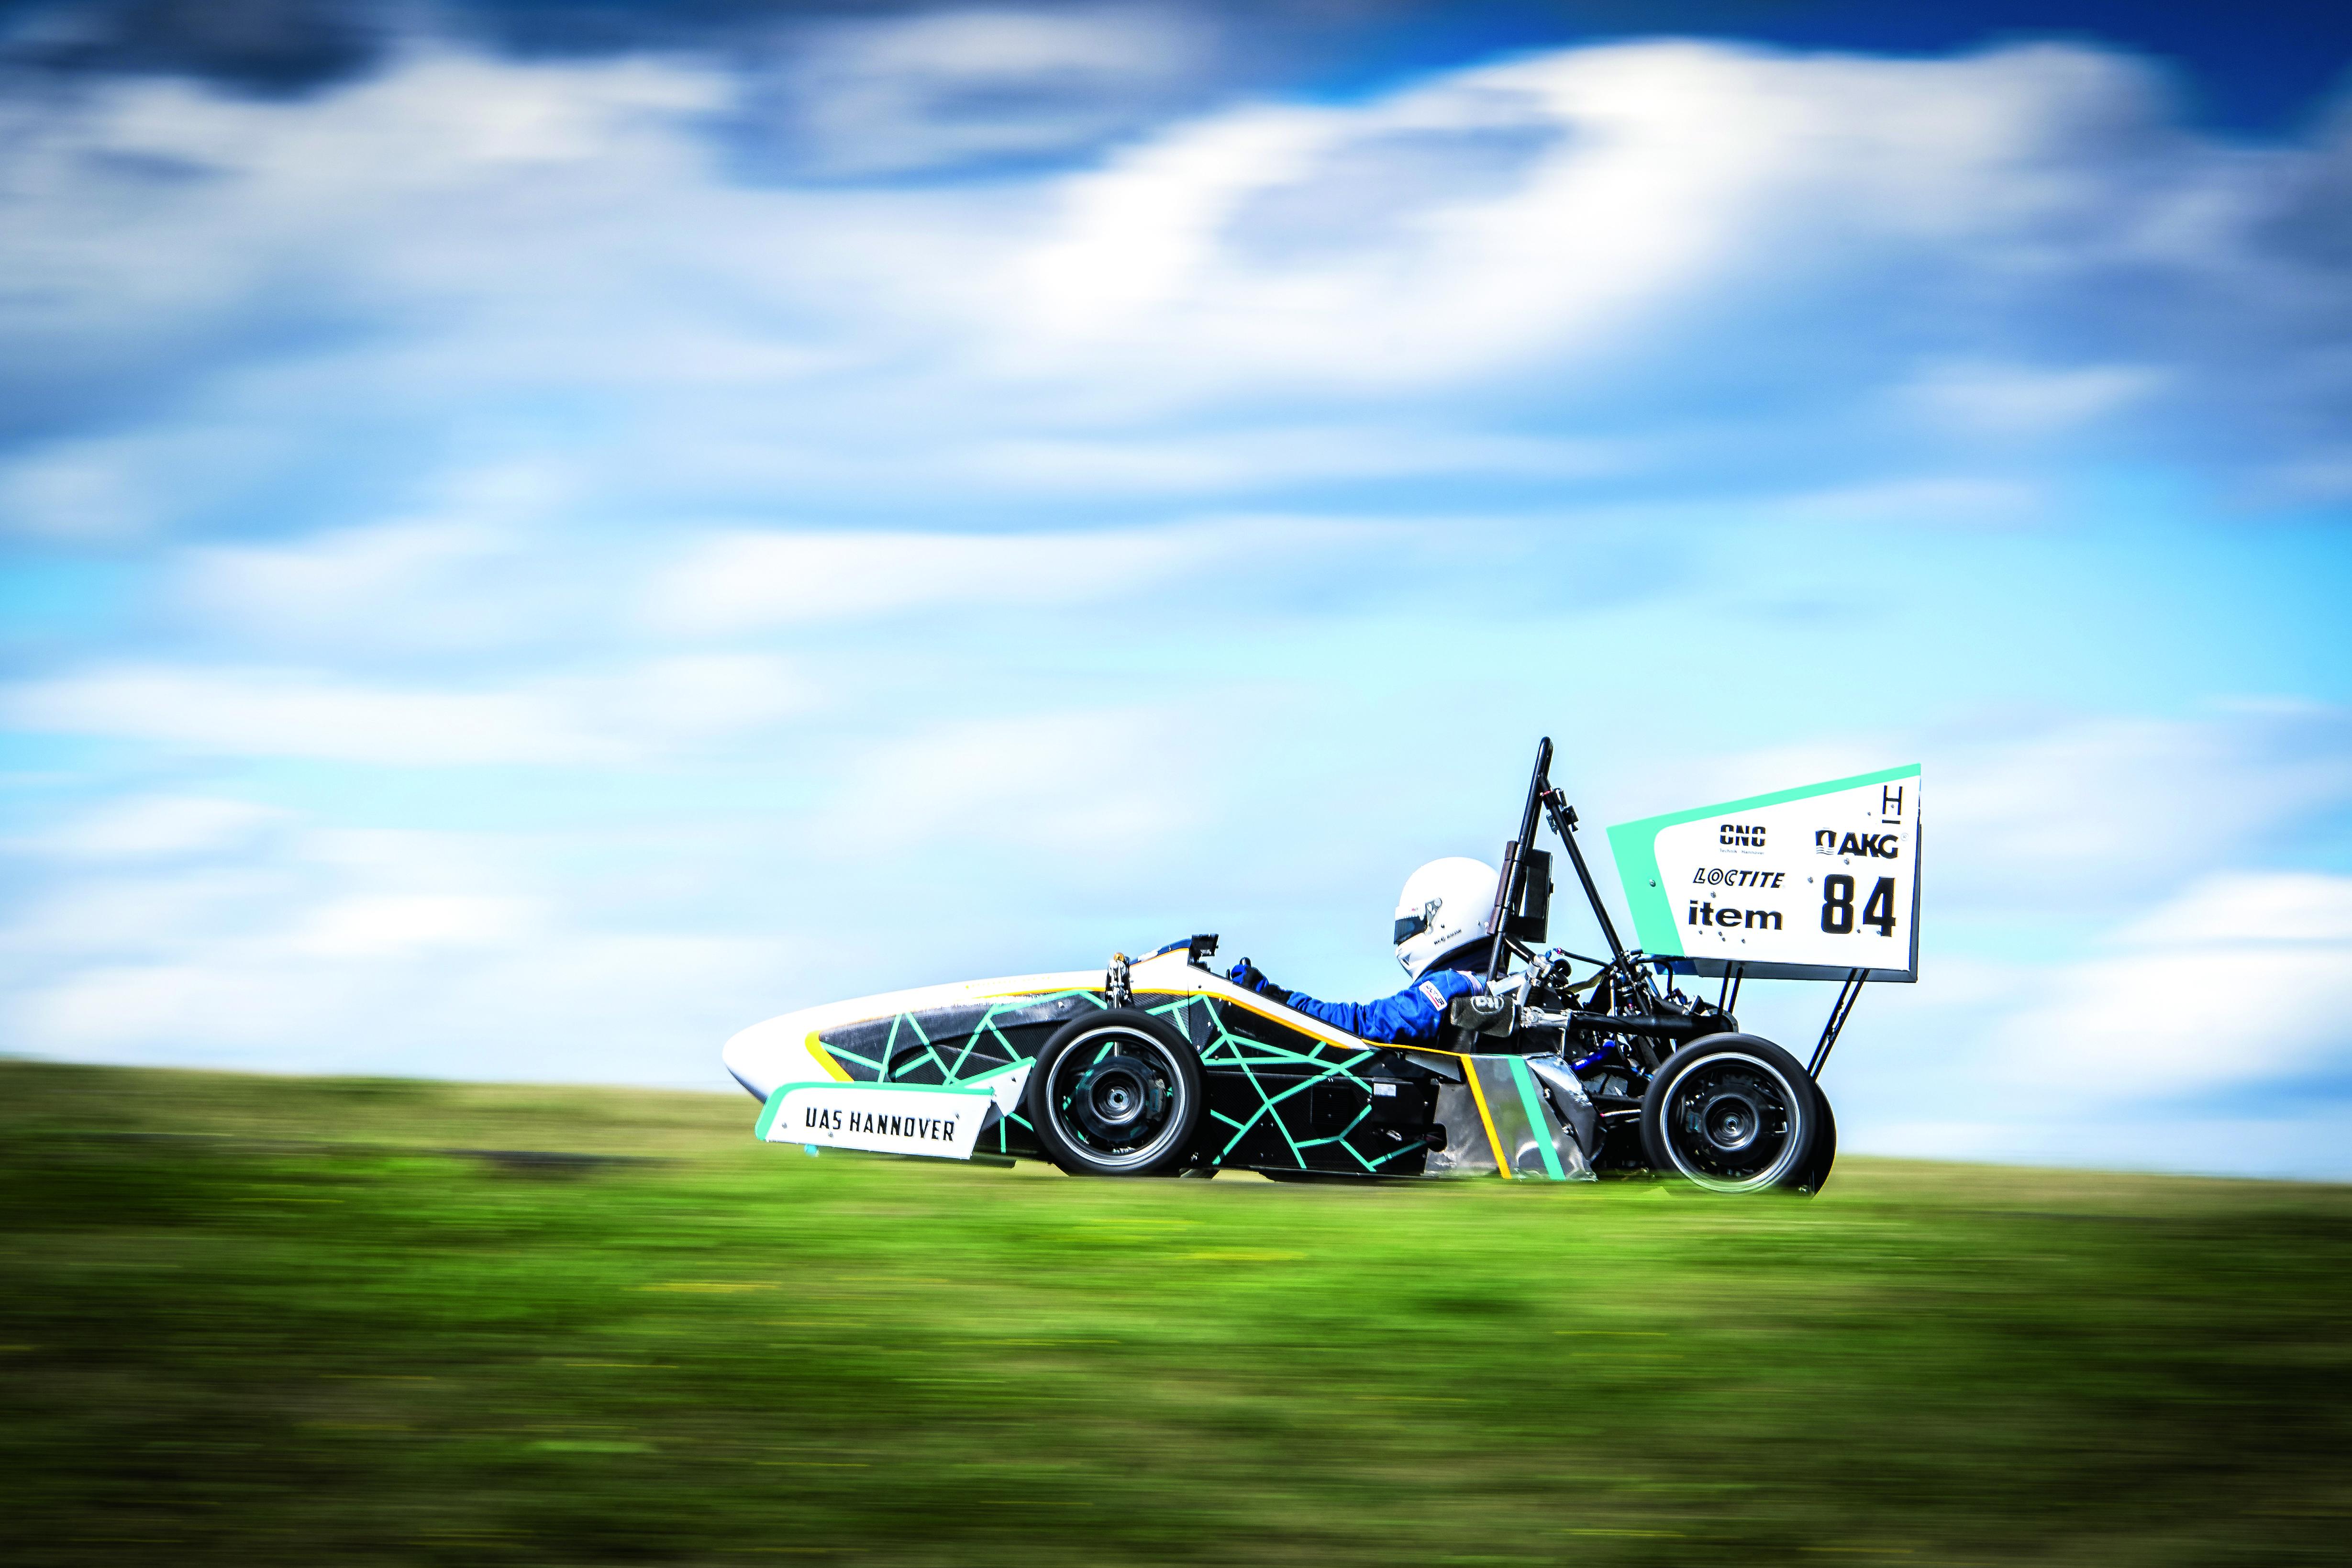 Foto: Campus Motorsport